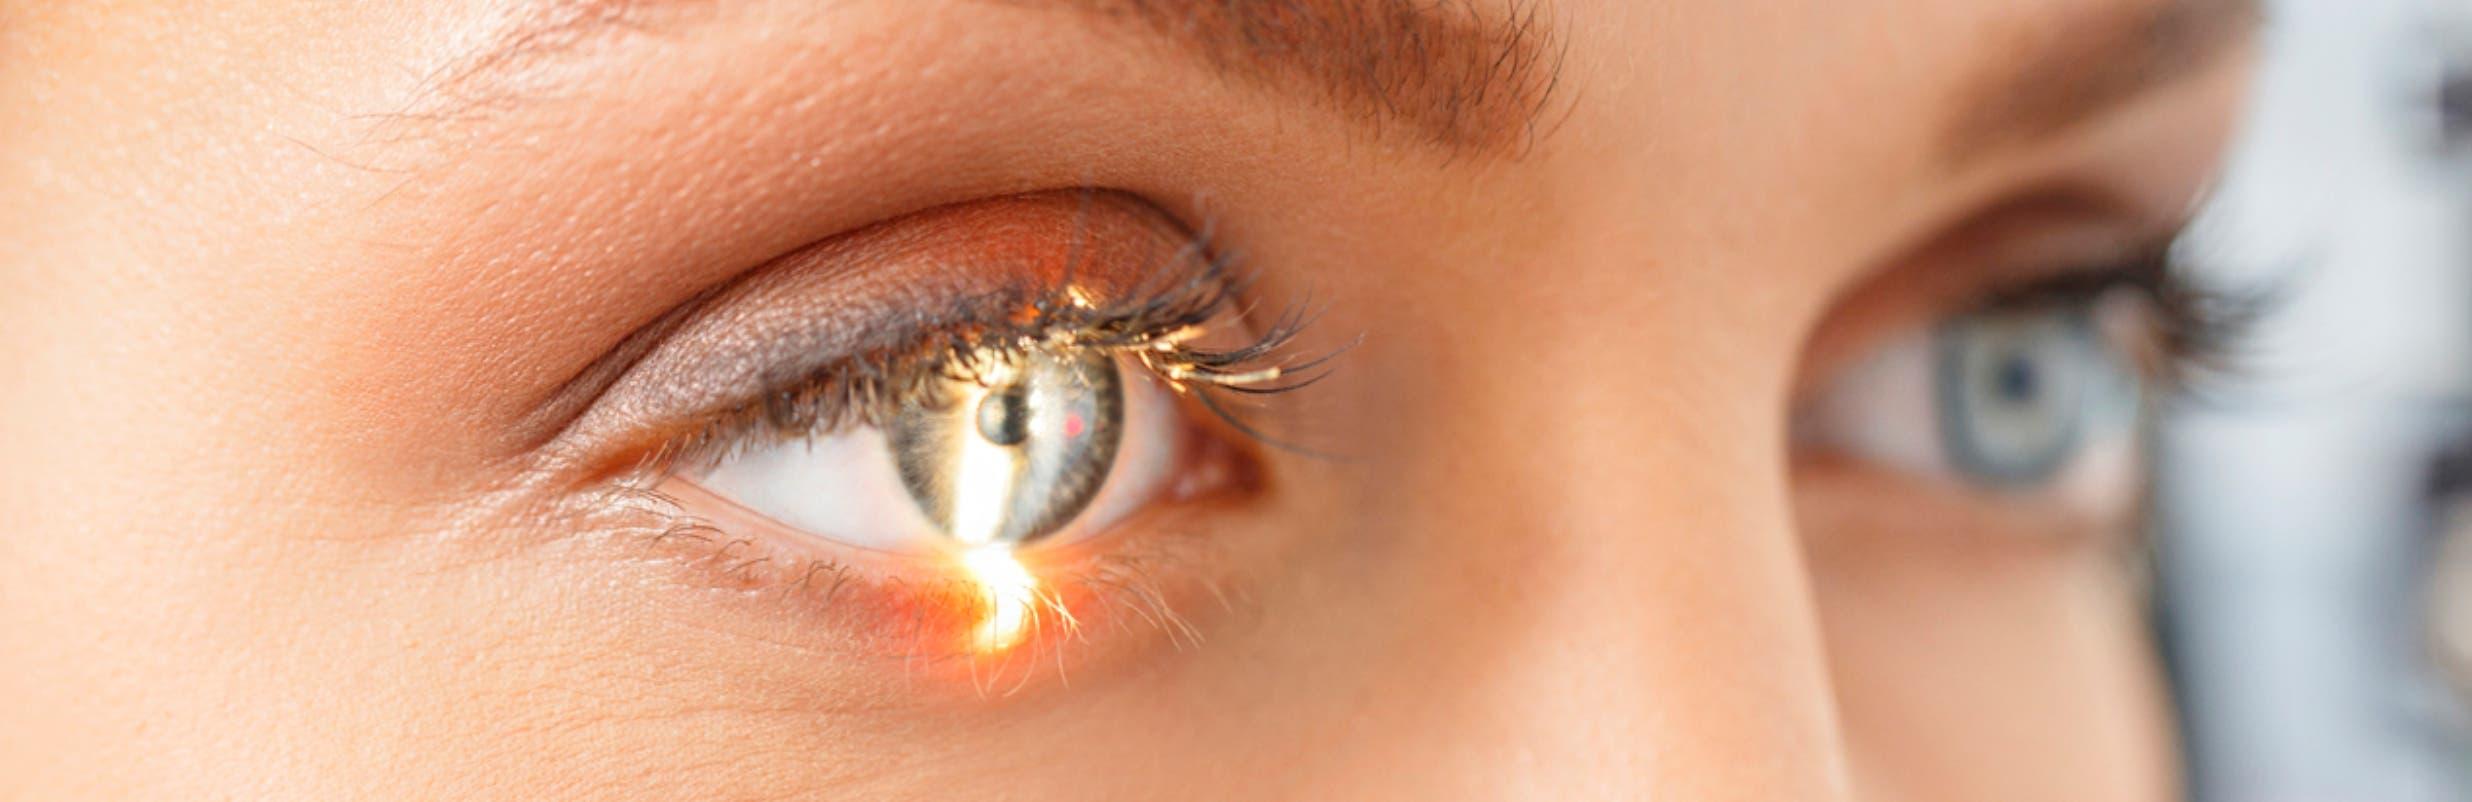 ojos_p01